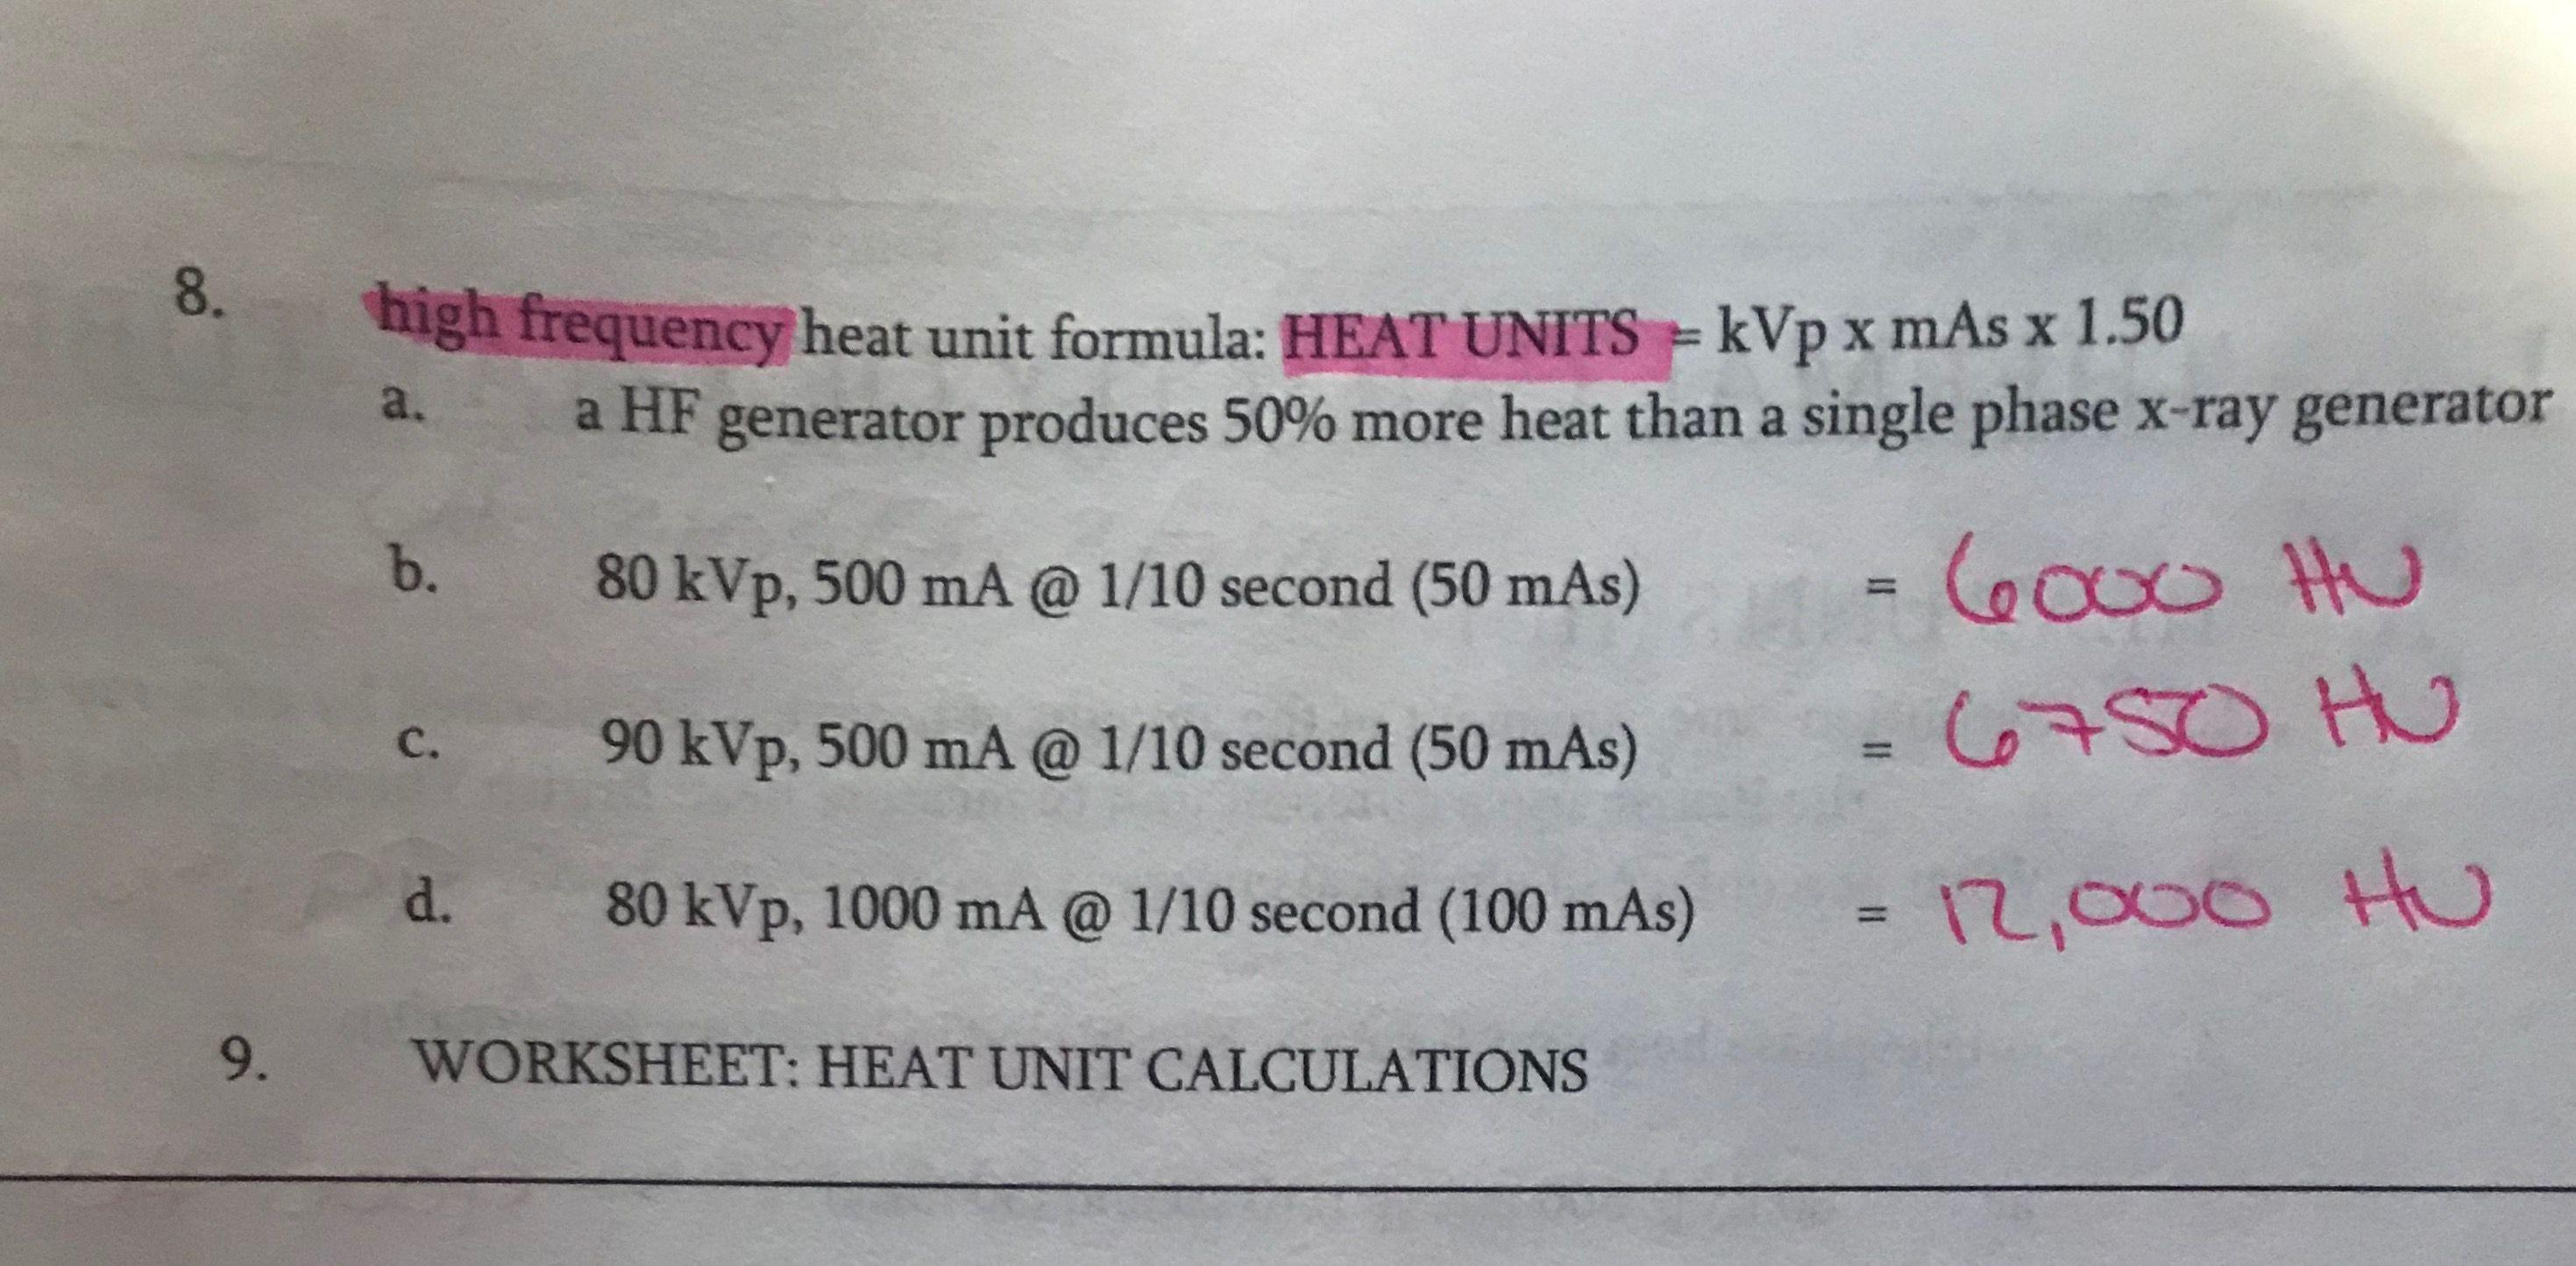 Heat Units Hf